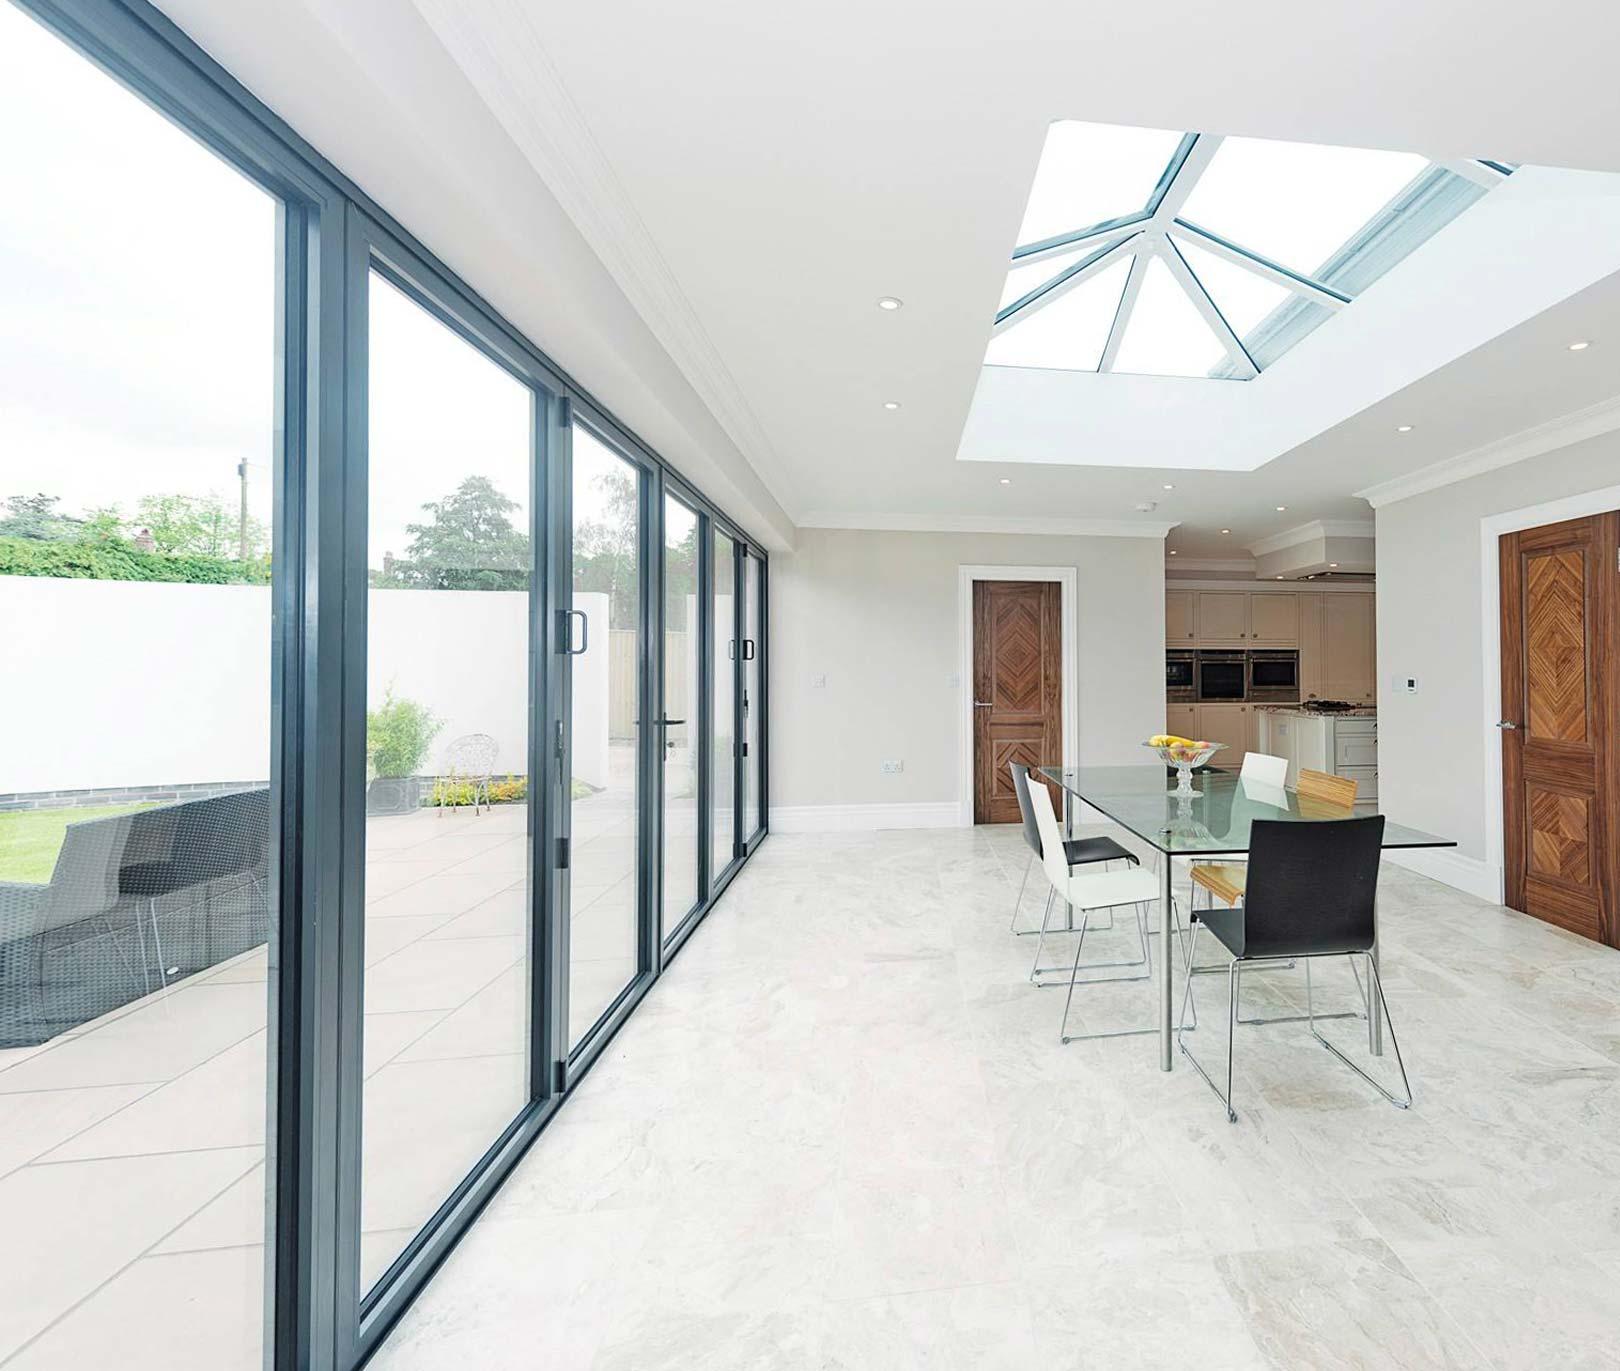 sliding glass doors energy efficient energy efficient sliding glass doors 105003495 energy. Black Bedroom Furniture Sets. Home Design Ideas